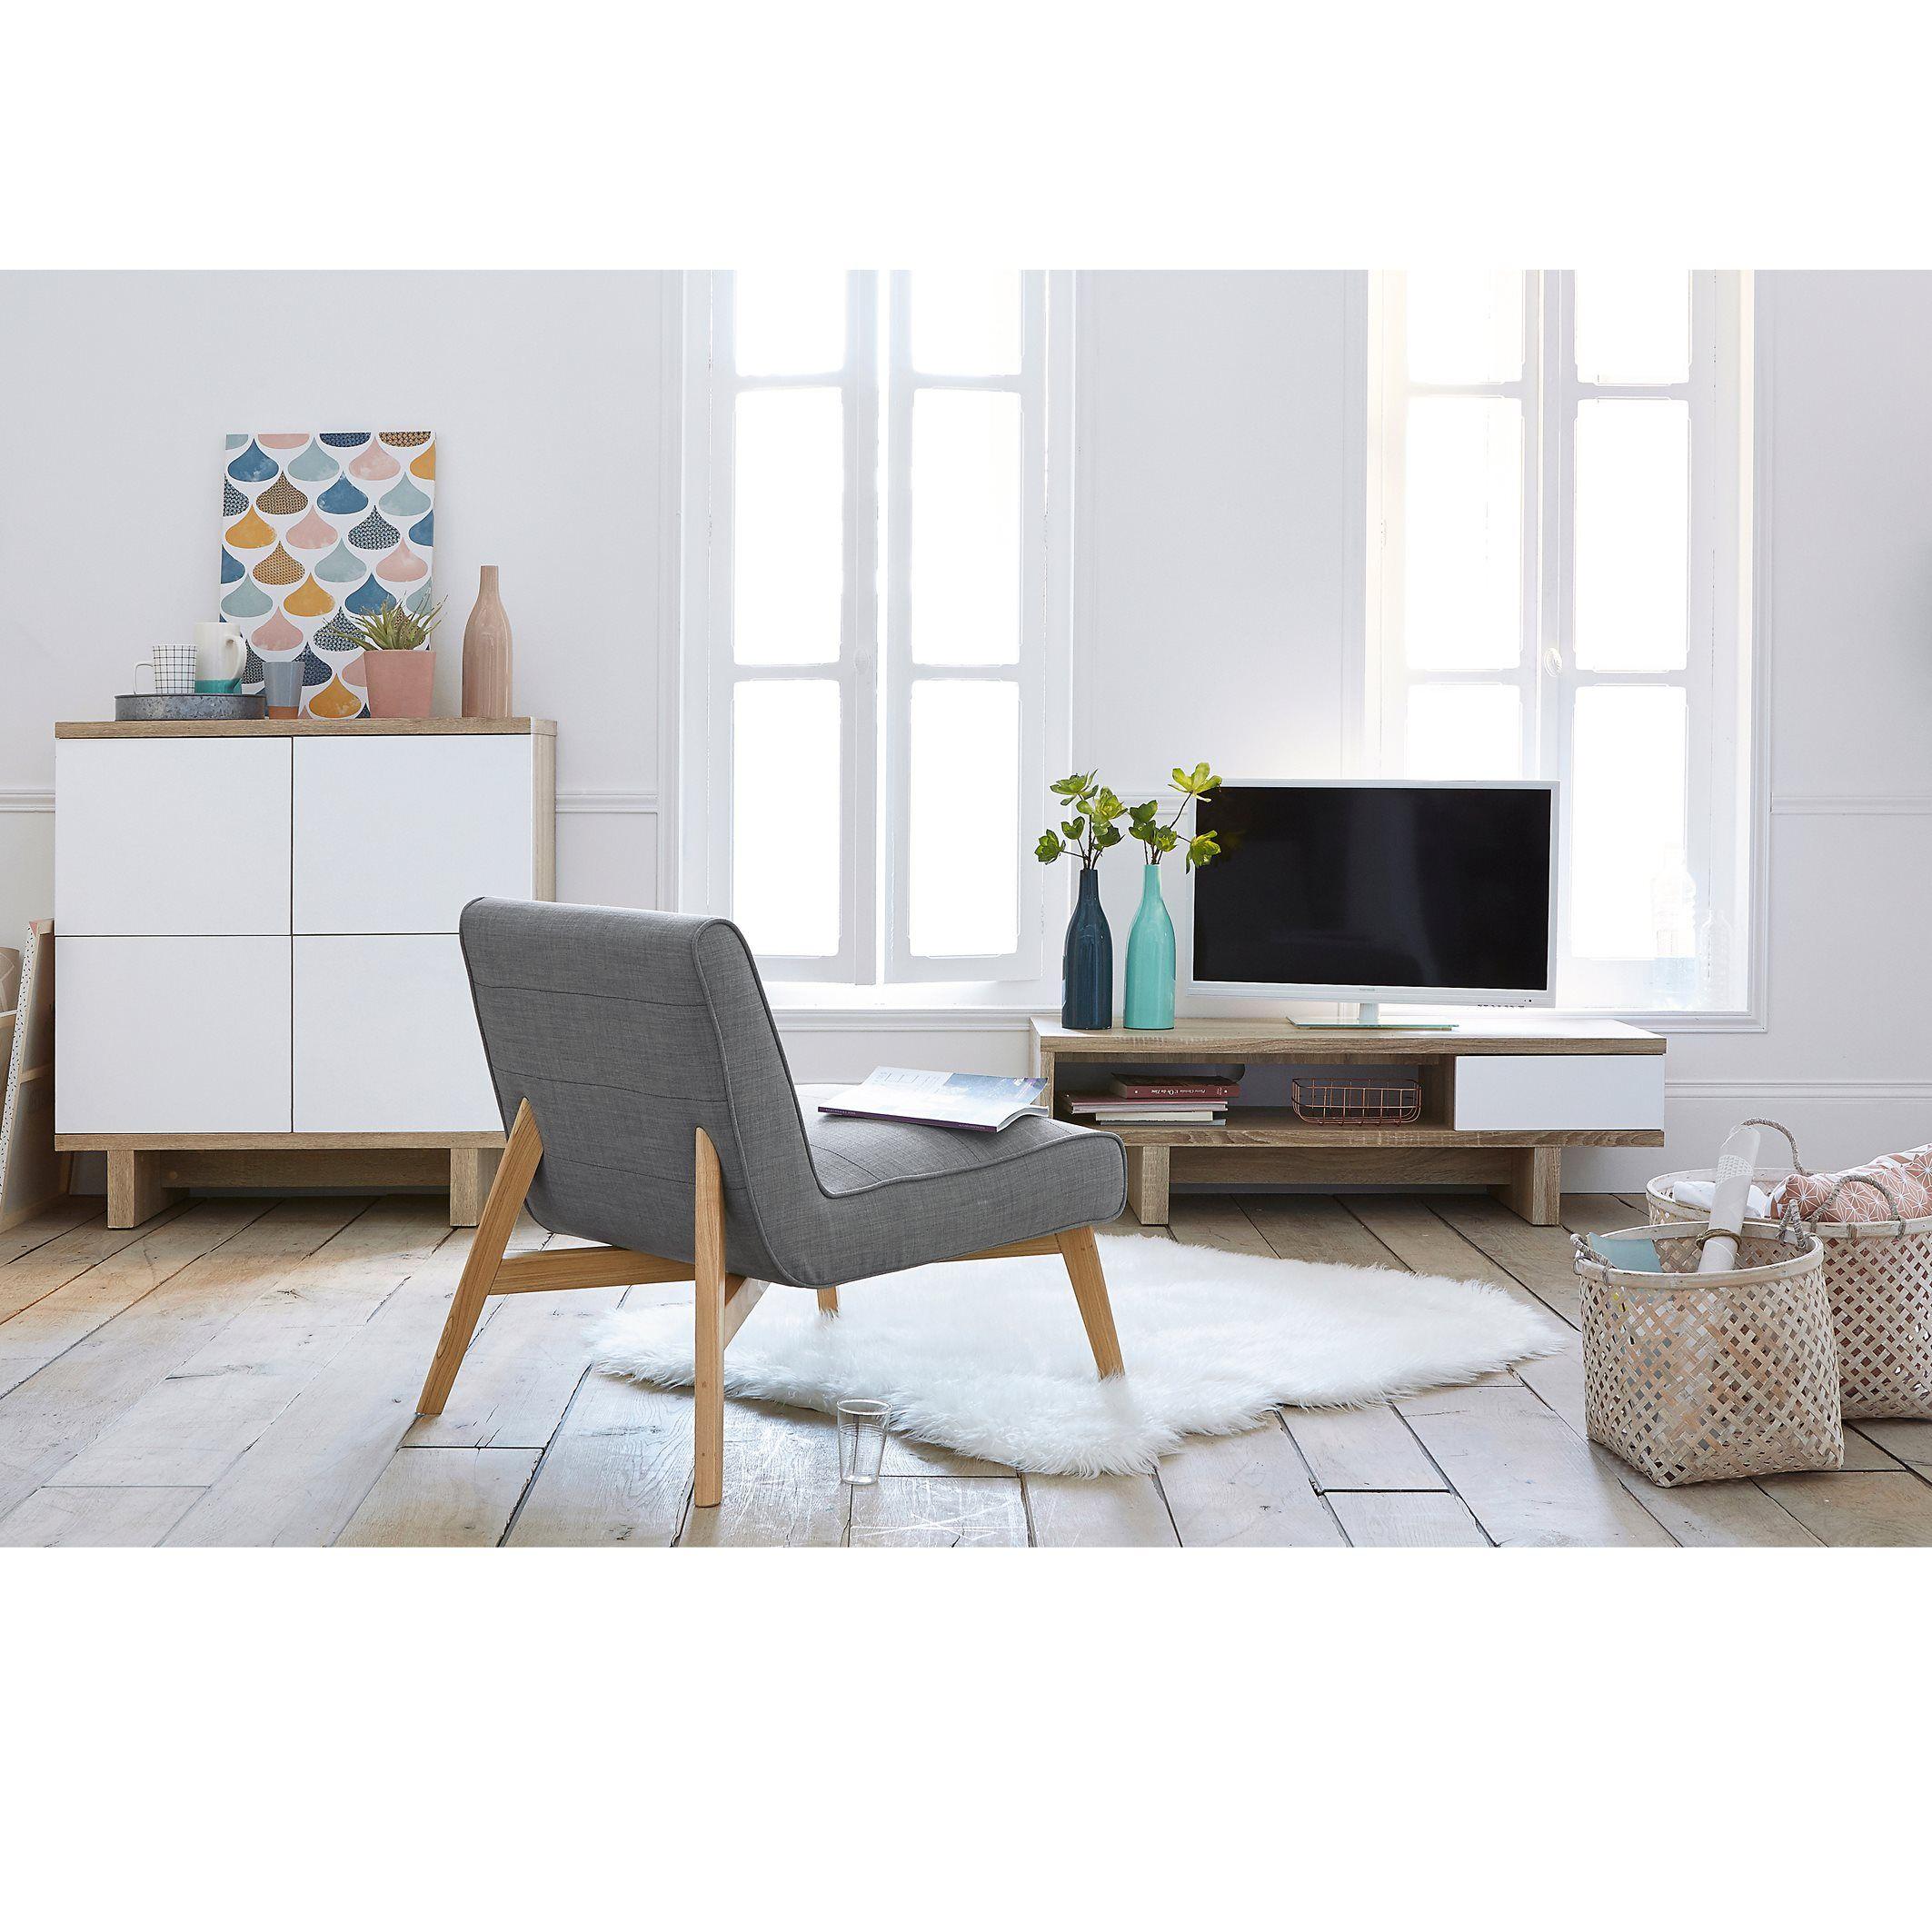 "Sessel ""jimi"" Grau La Redoute Interieurs | La Redoute"